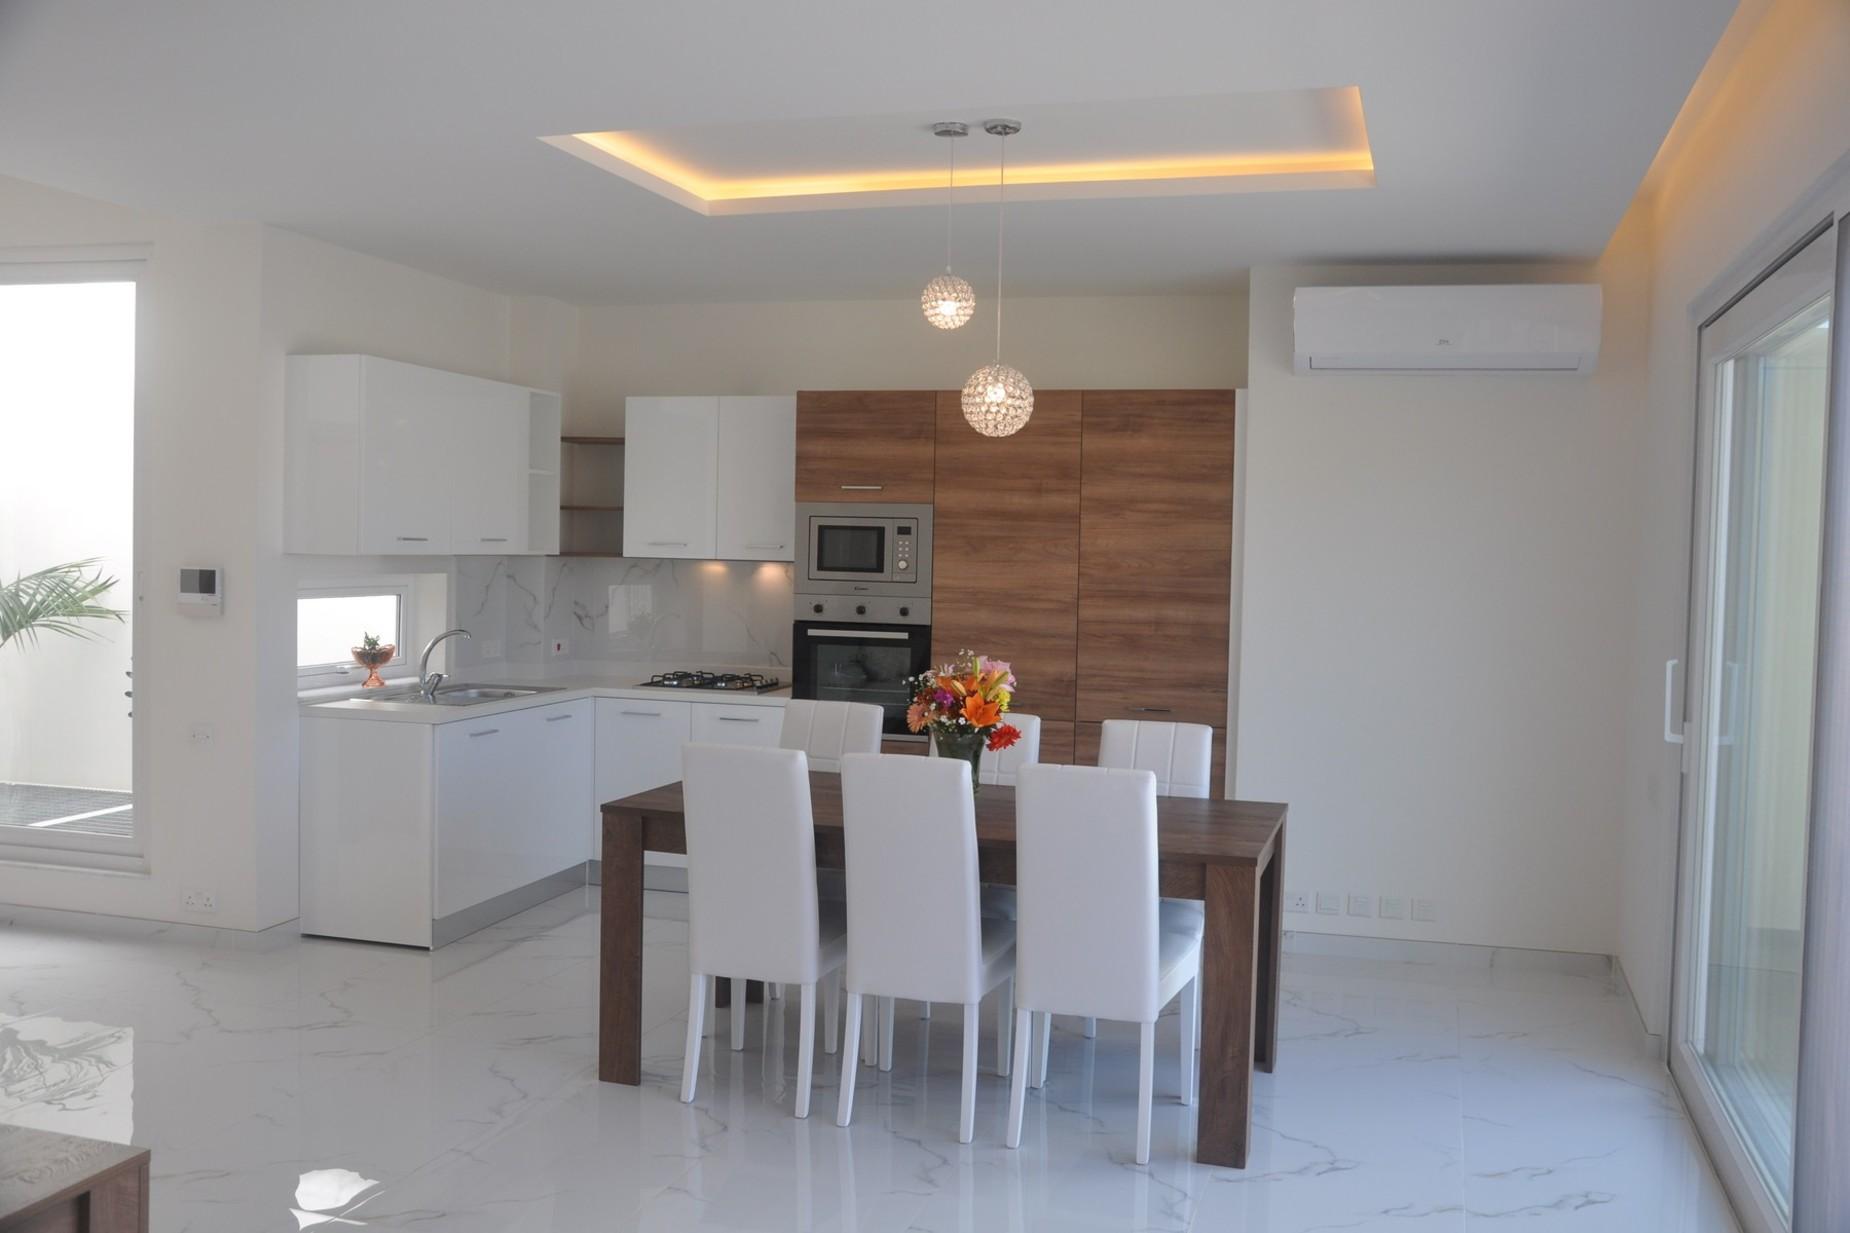 2 bed Penthouse For Sale in Kalkara, Kalkara - thumb 2